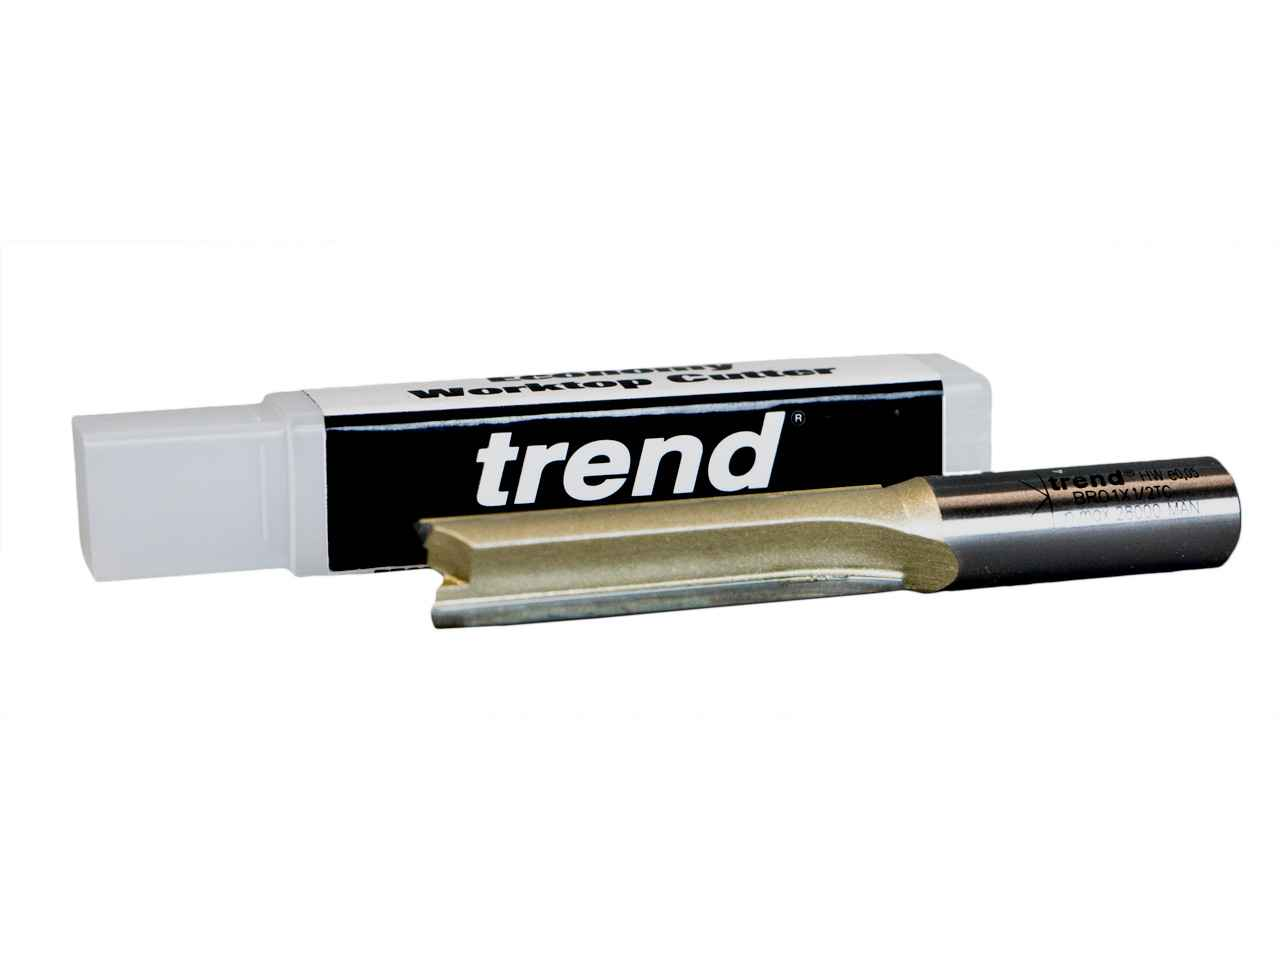 Trend_DEALBR0130.jpg